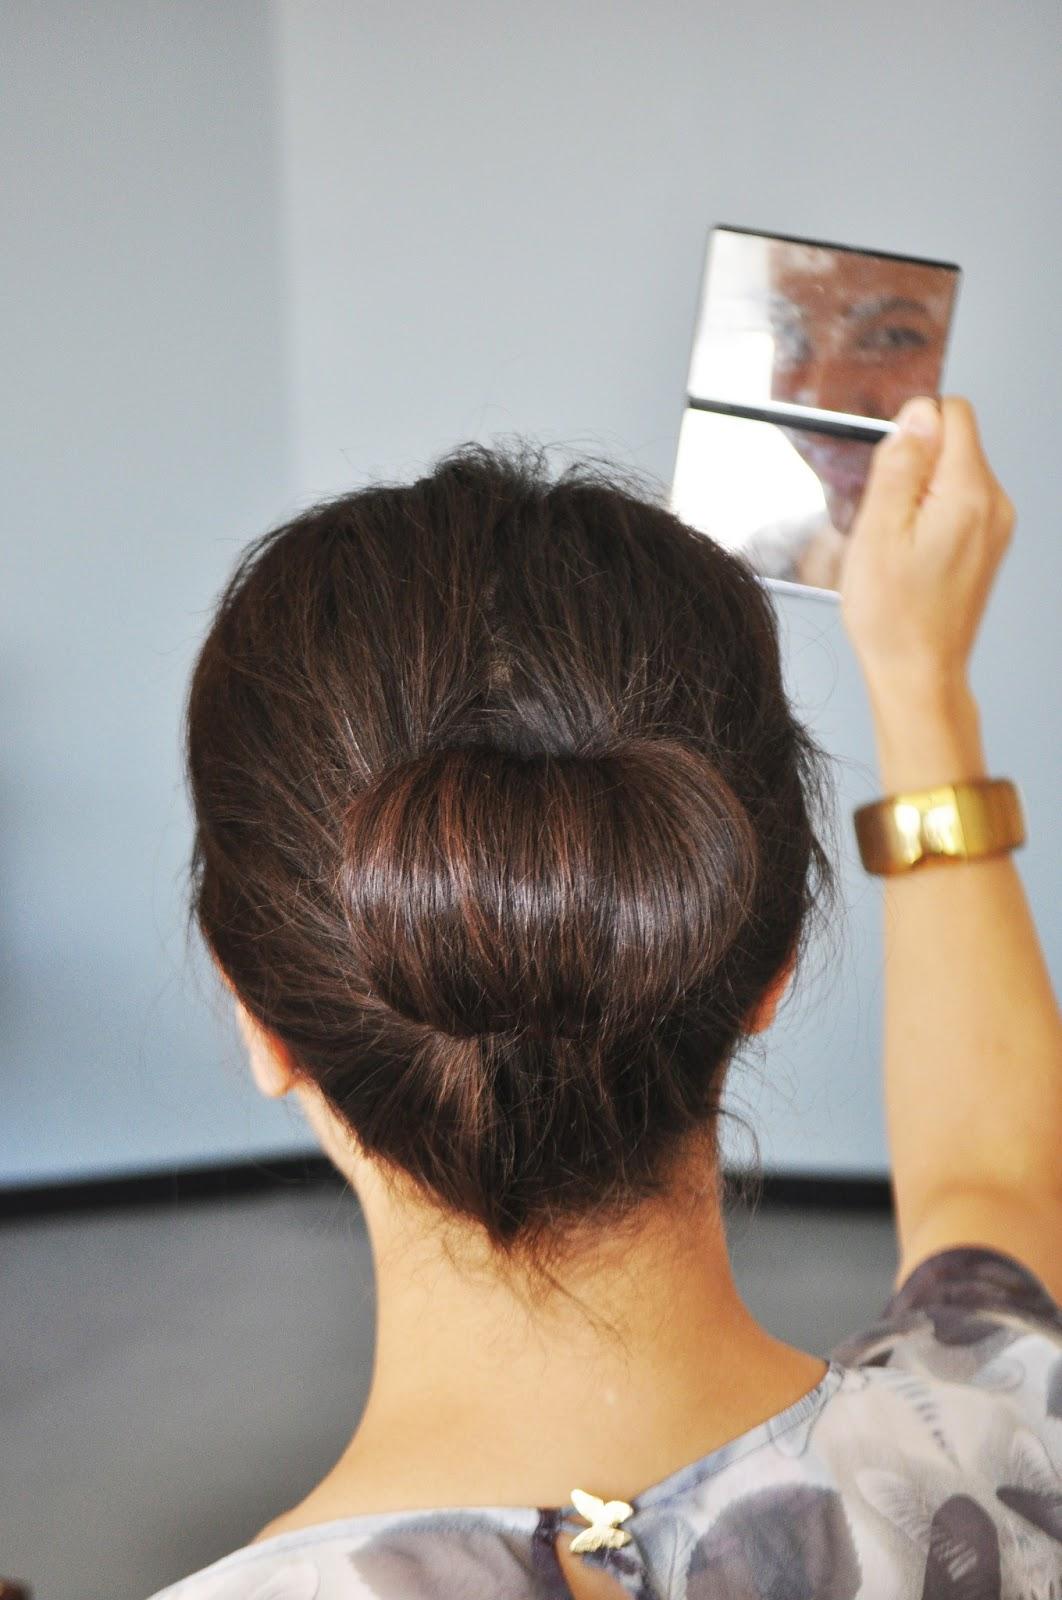 Tutorials For Makeup: Hair + DIY Tutorials: Shoulder Length